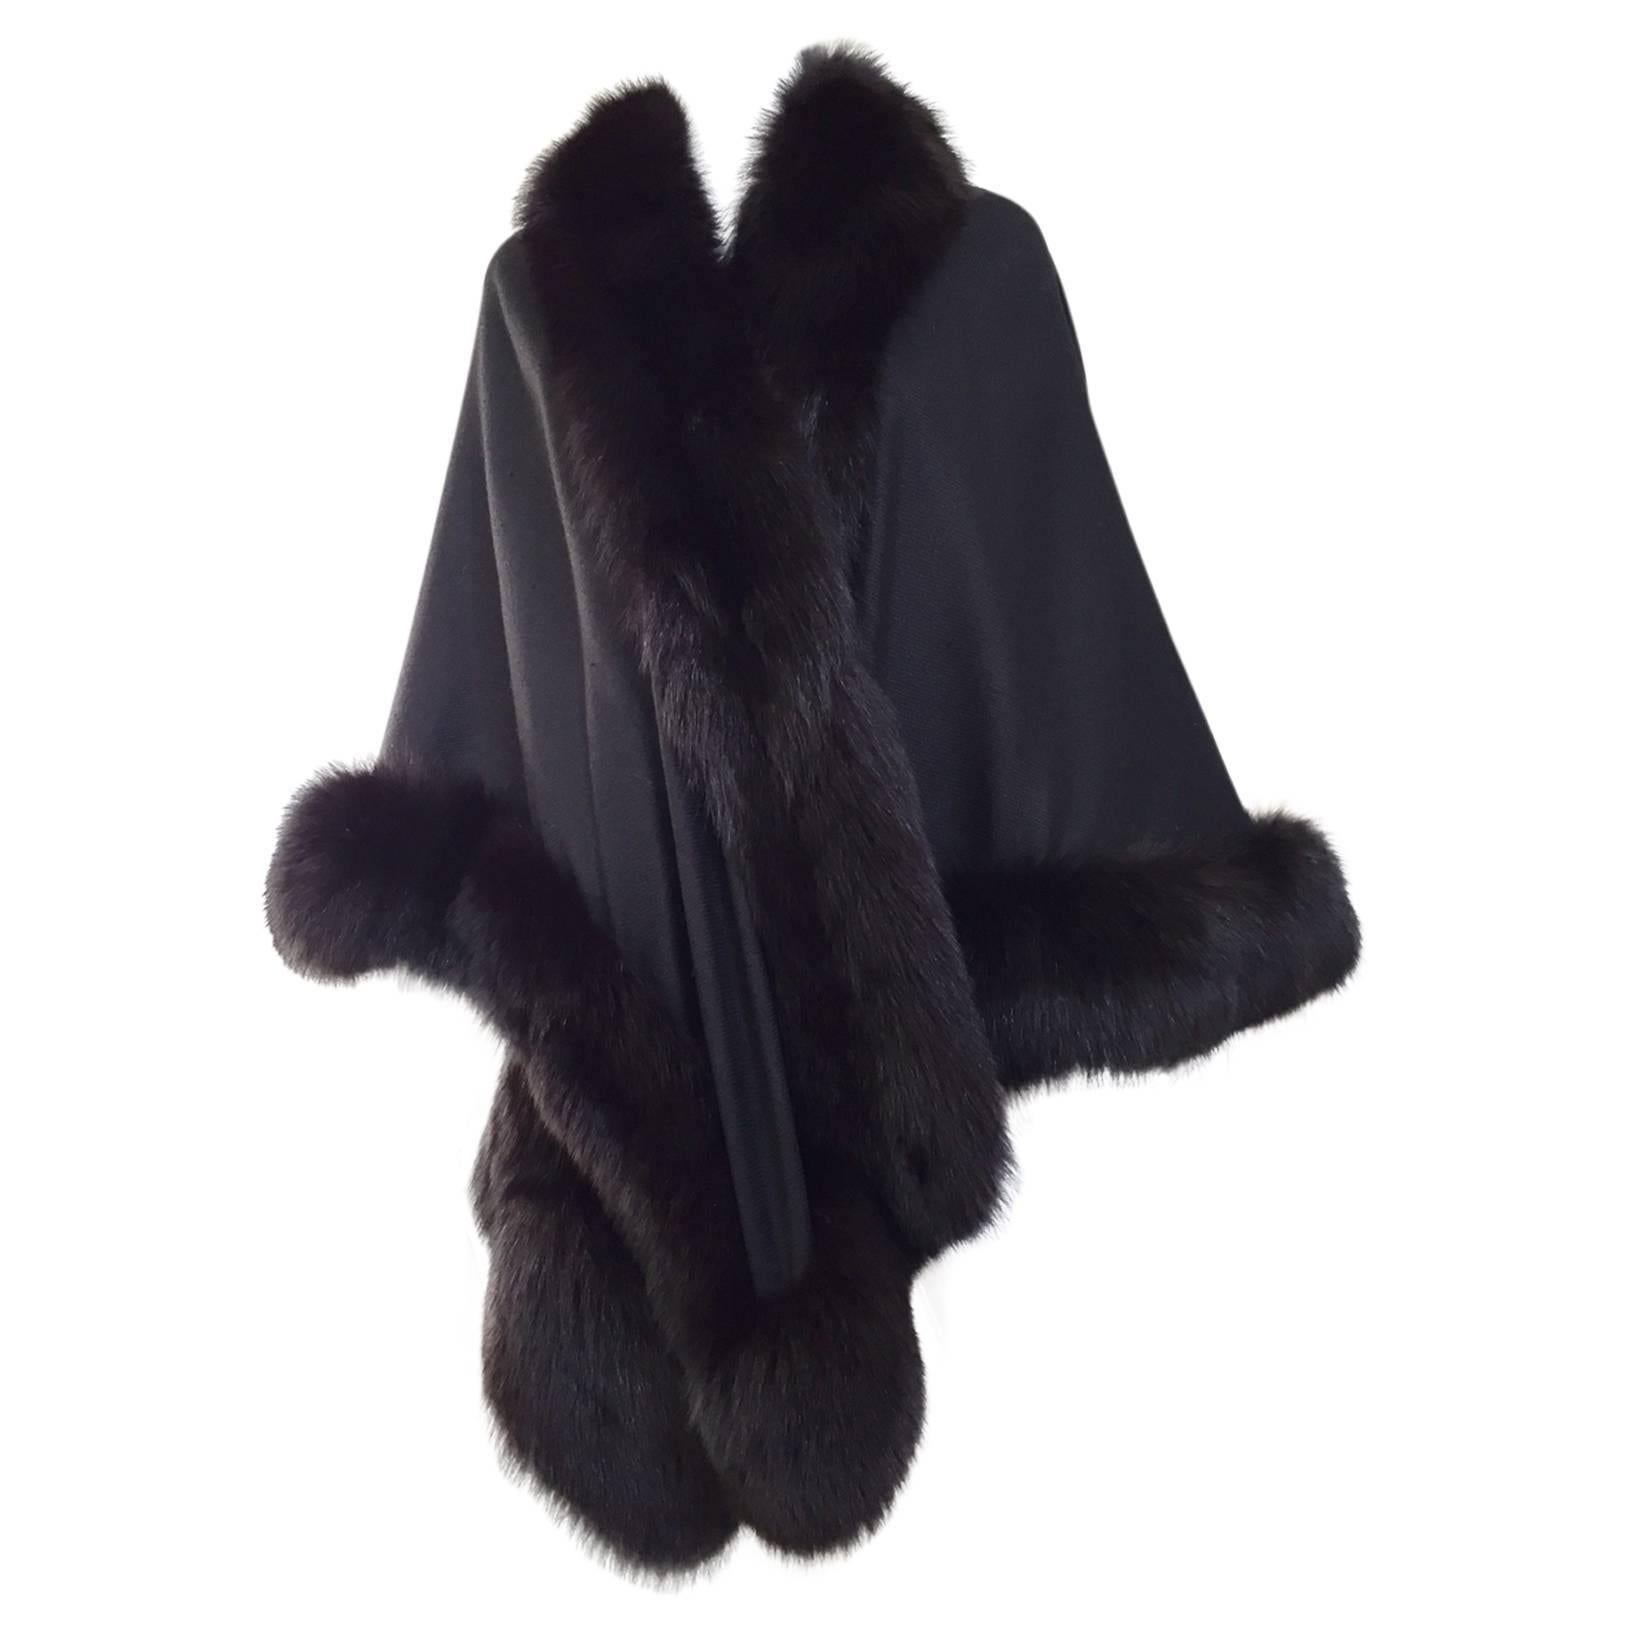 1980s Black Wool Shawl With Fox Trim